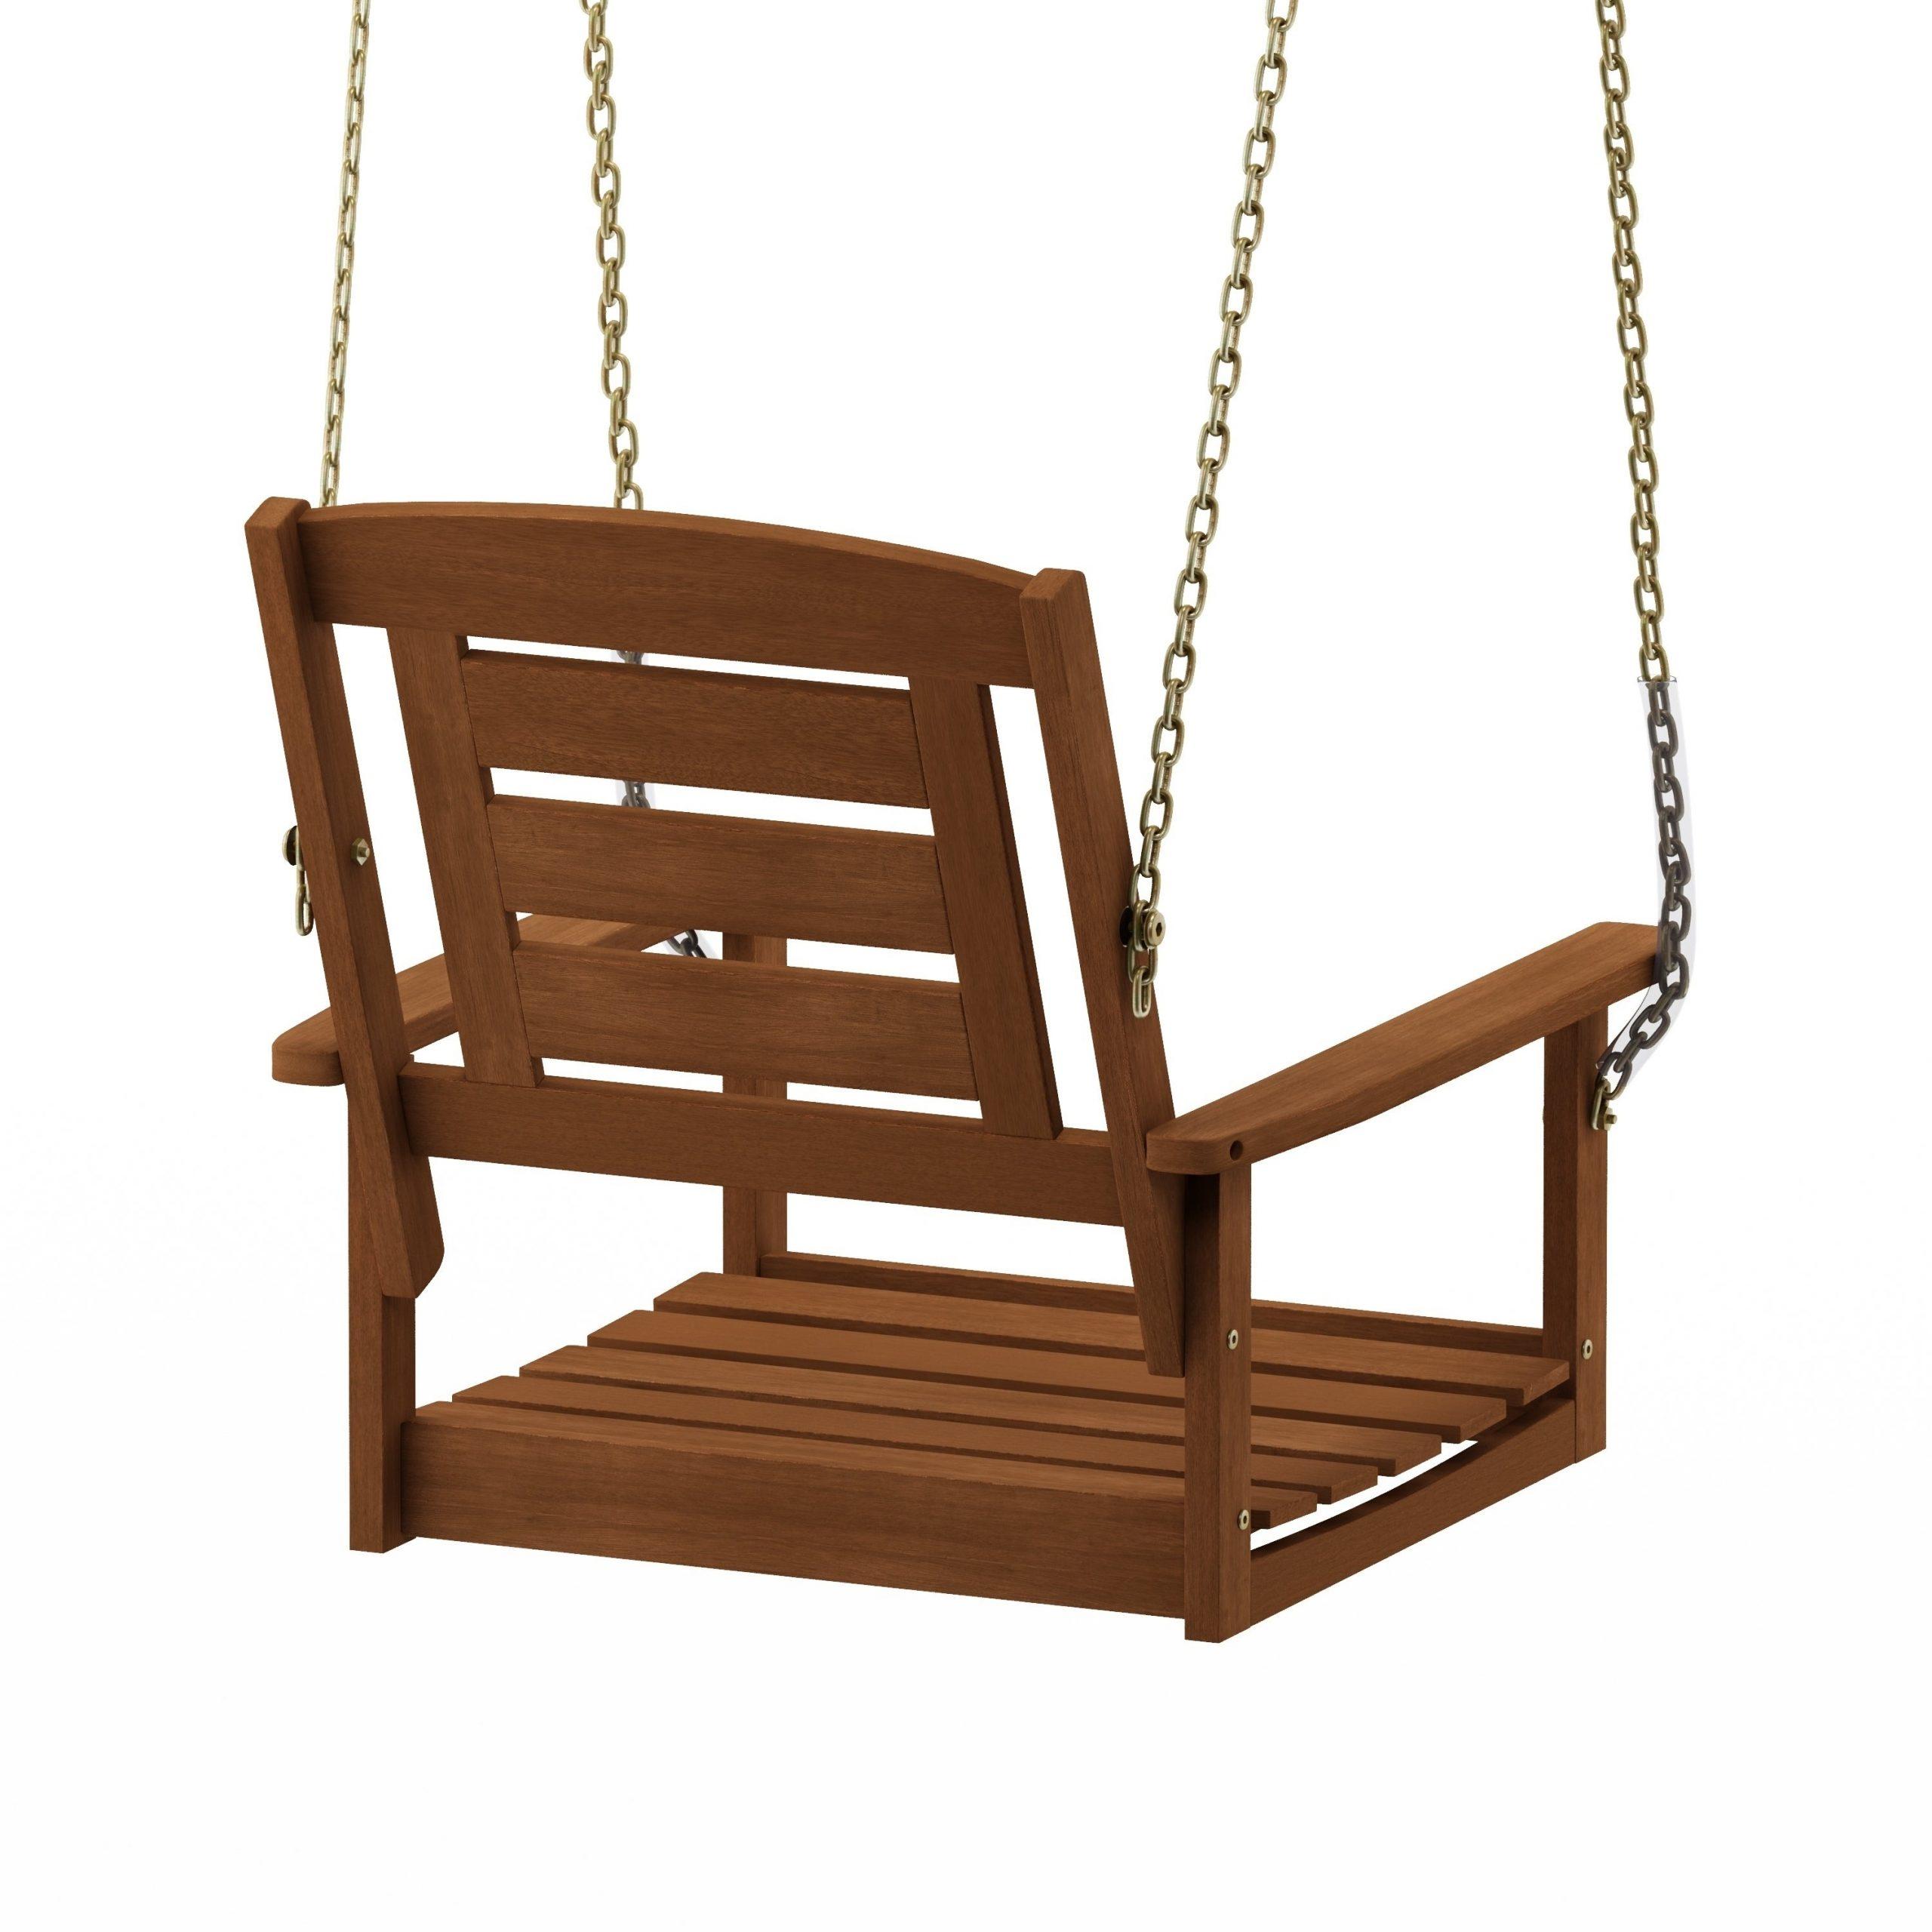 Havenside Home Ormond Hardwood Single Hanging Porch Swing With Chain In Porch Swings With Chain (View 2 of 25)